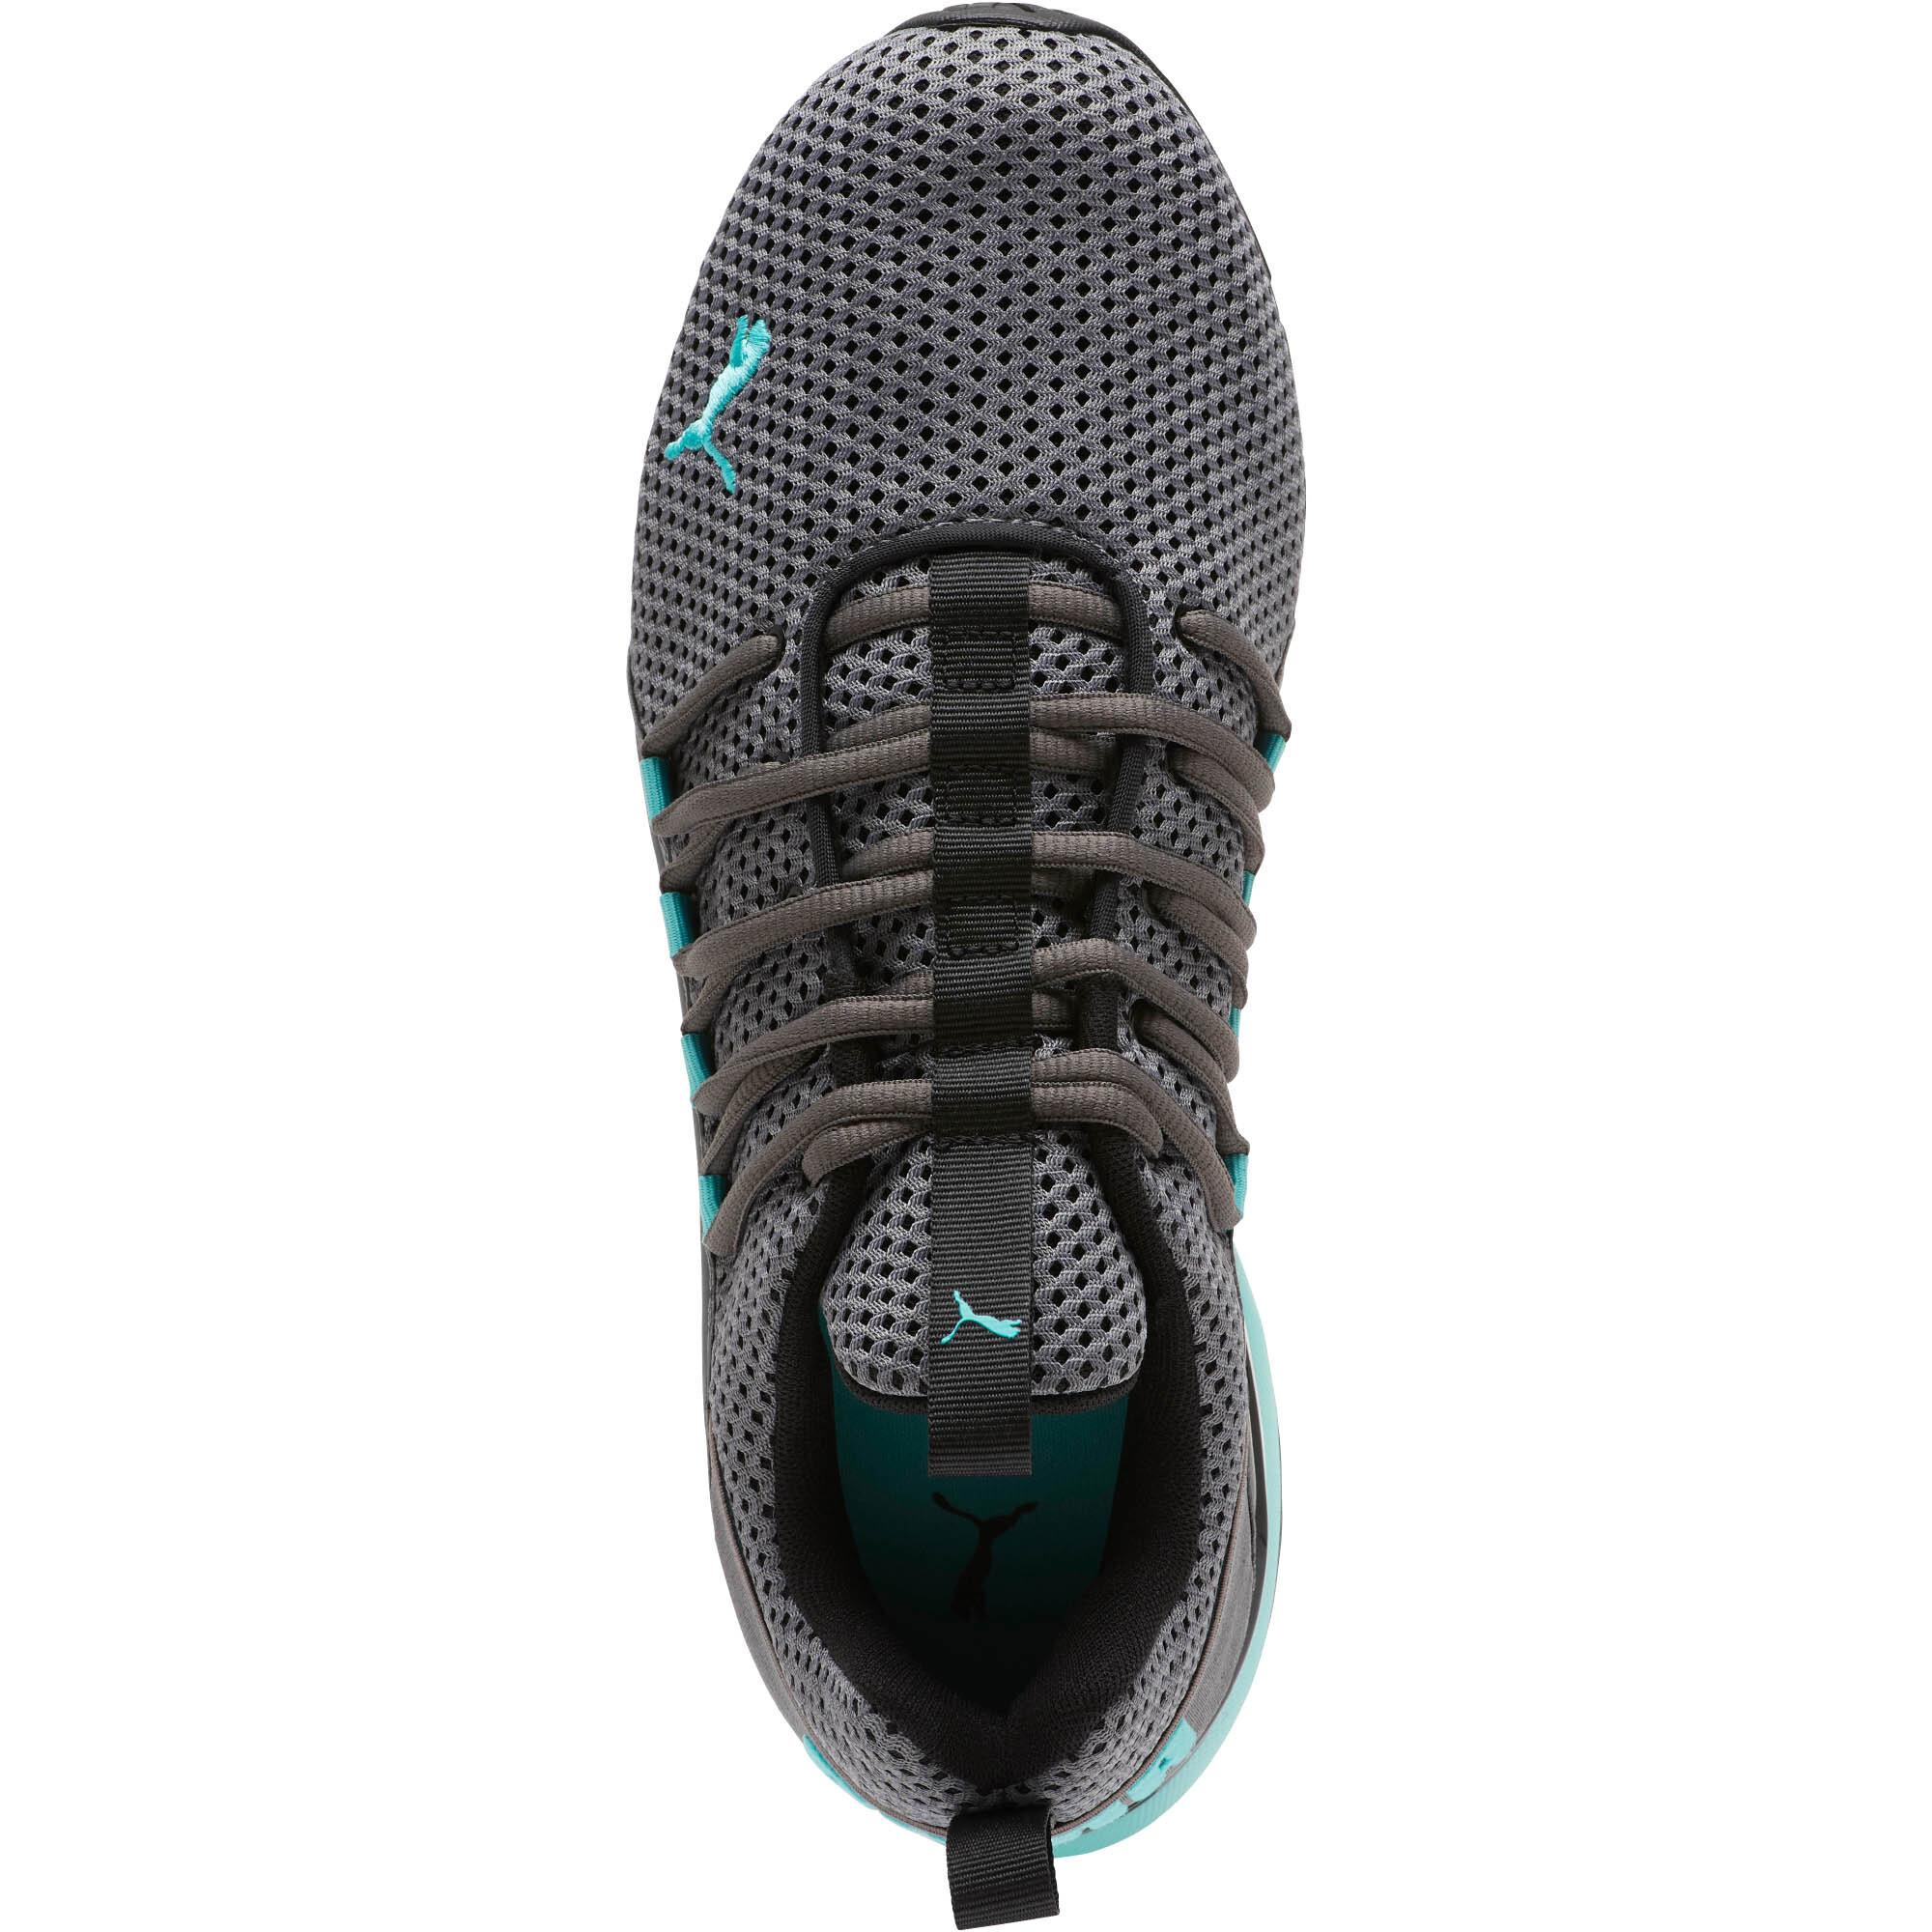 PUMA-Axelion-Breathe-Men-s-Training-Shoes-Men-Shoe-Running thumbnail 11